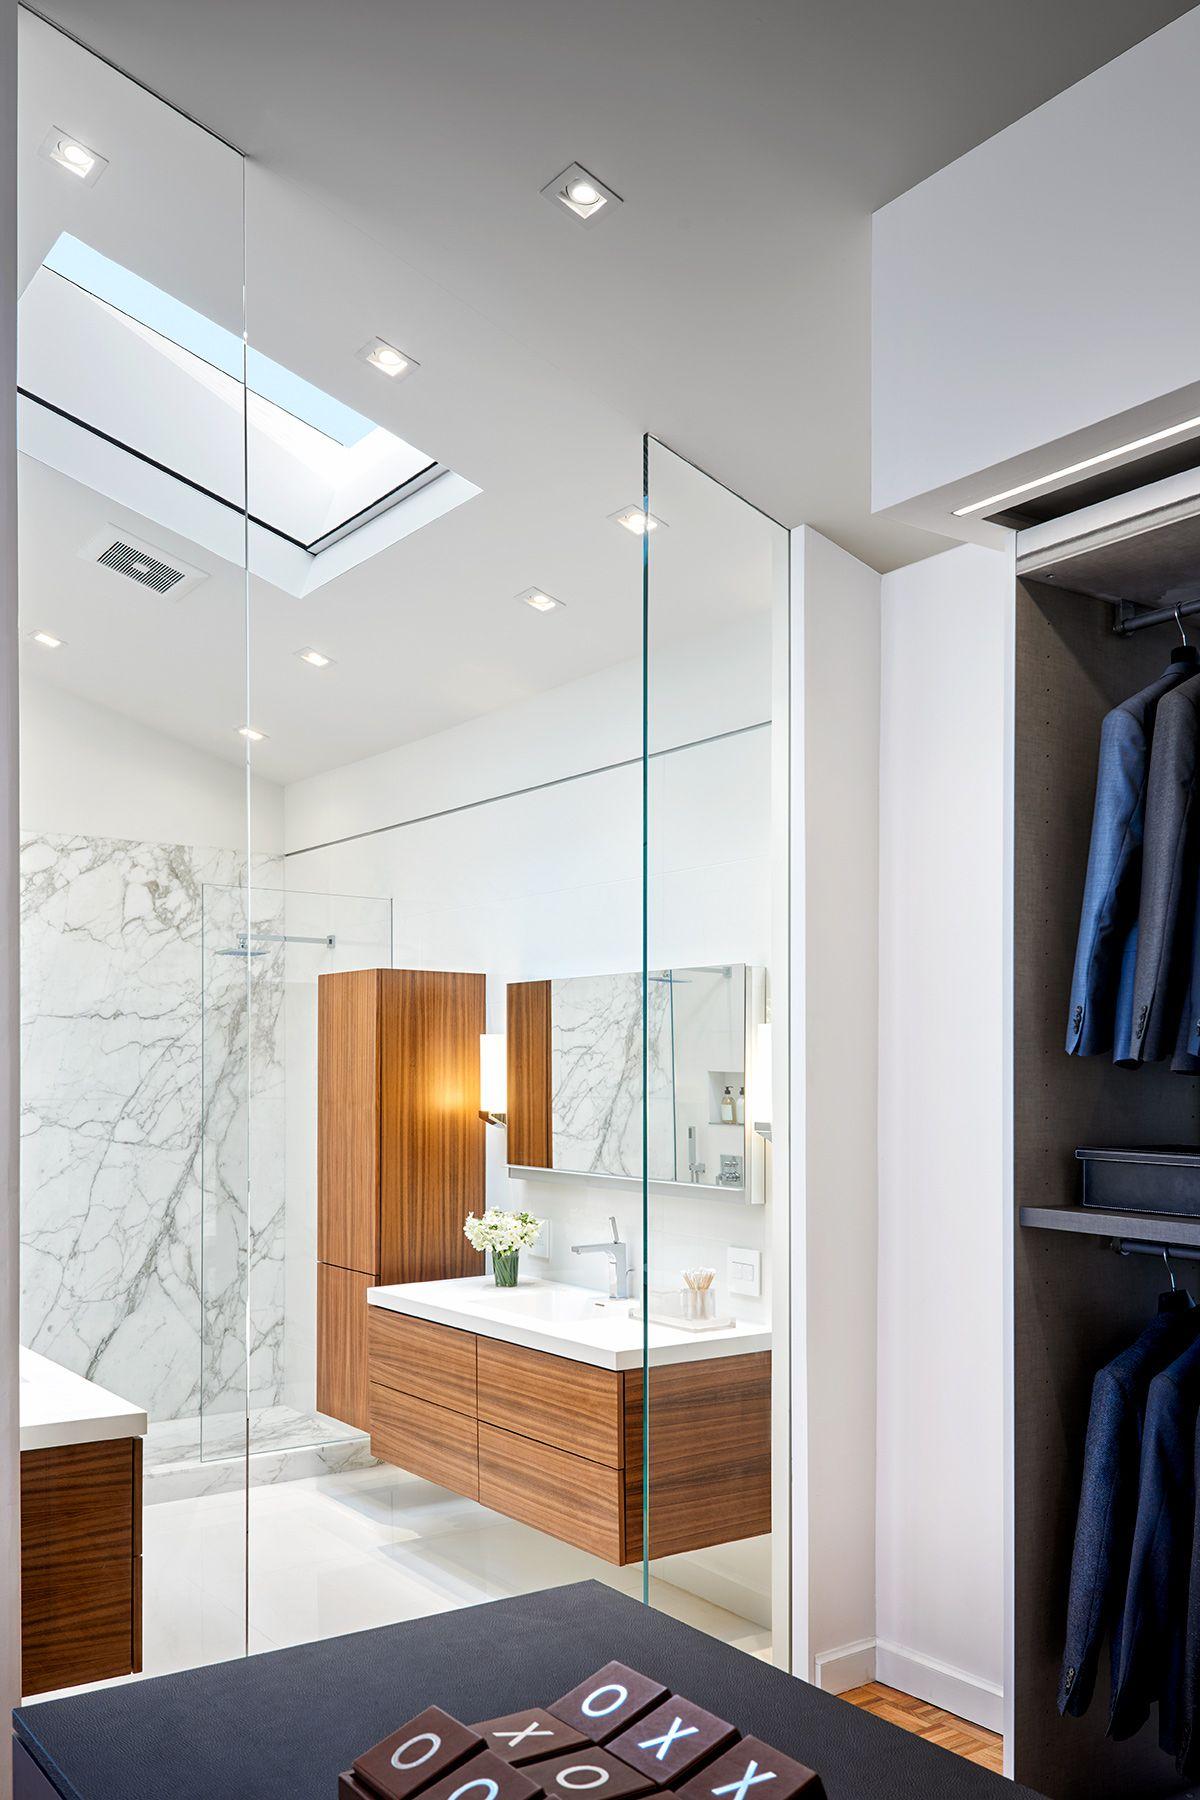 John-Sutton-Photography-Residential Bathroom